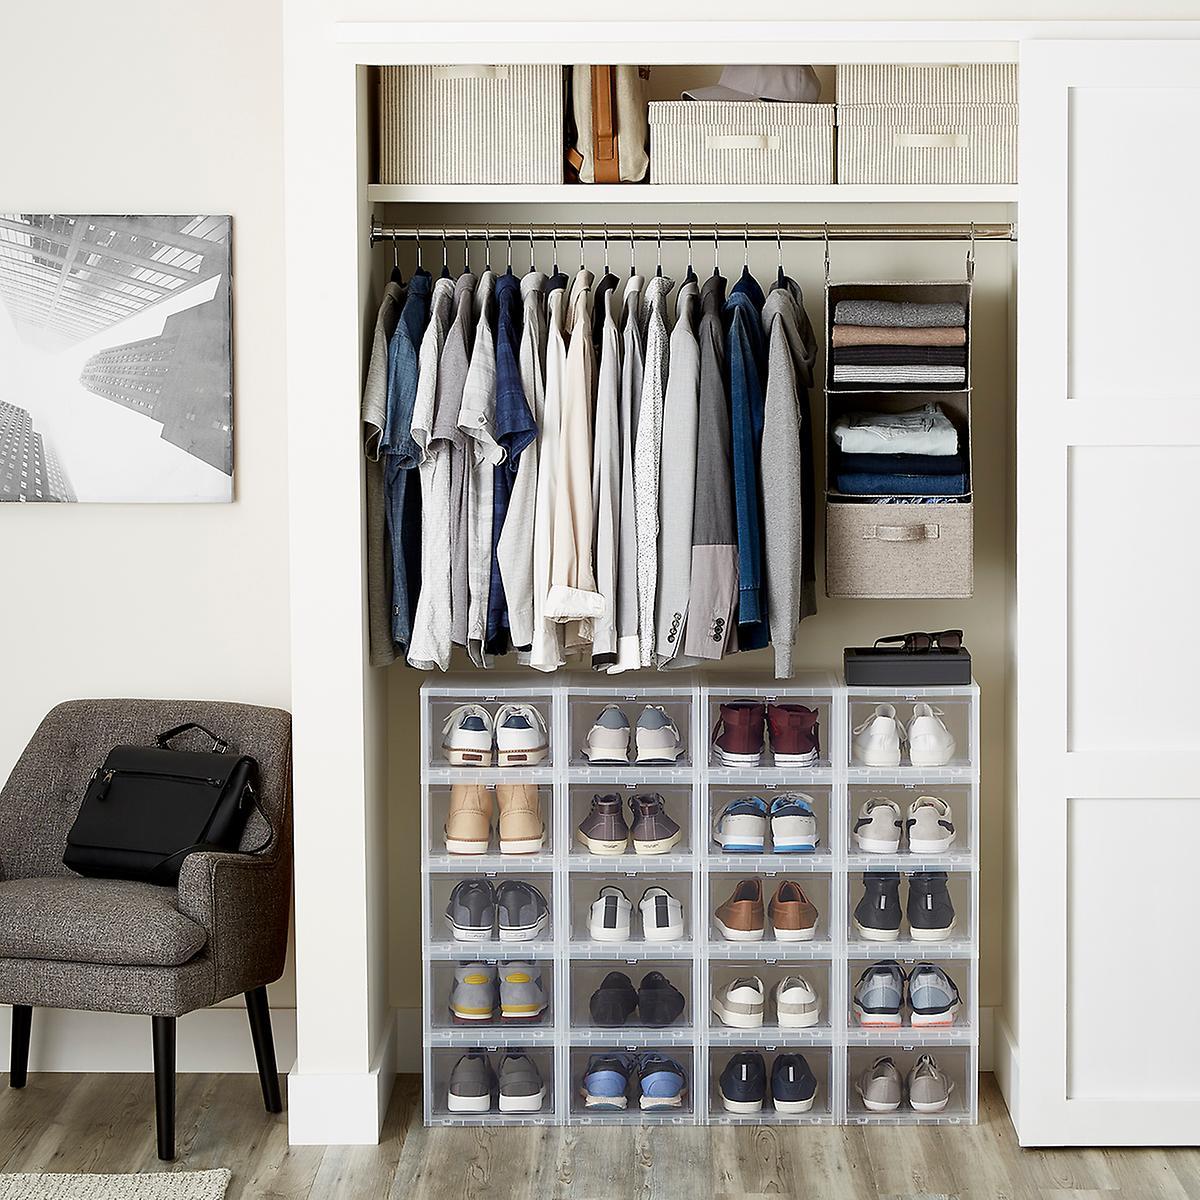 ikea men original ohperfect closet shoe mens ideas very design